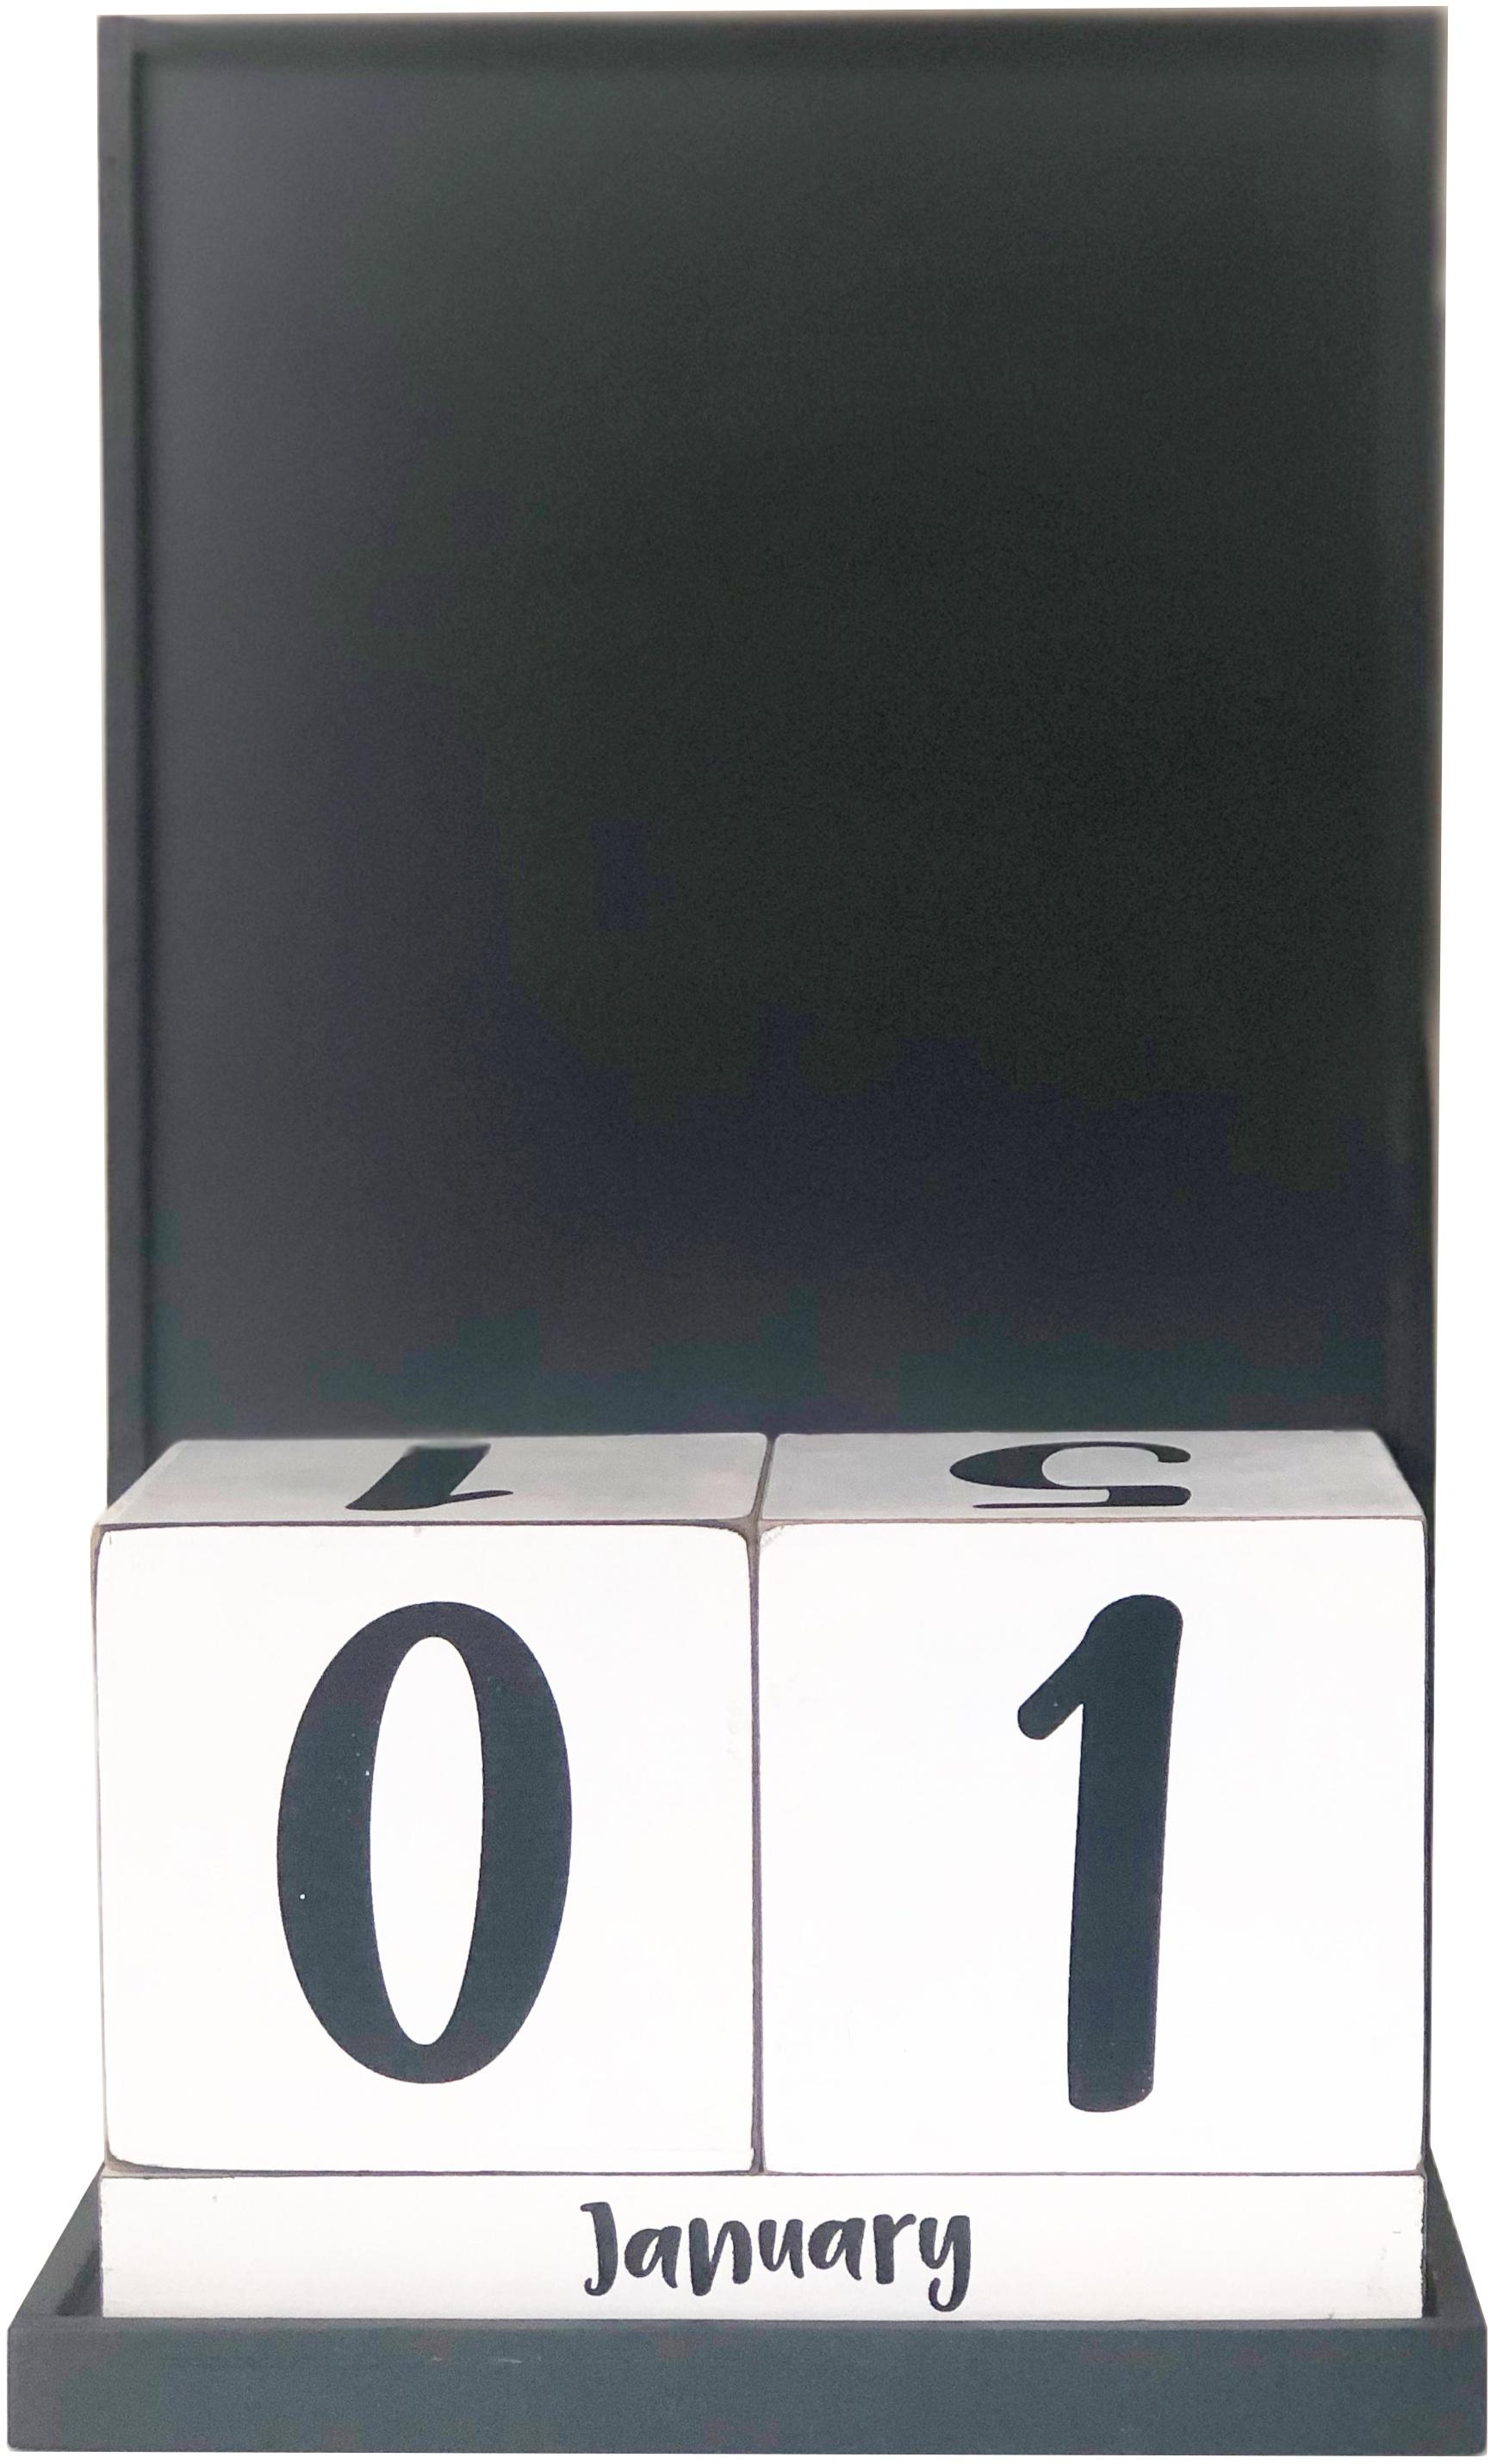 Foundations Decor Magnetic Block Countdown Calendar-Base